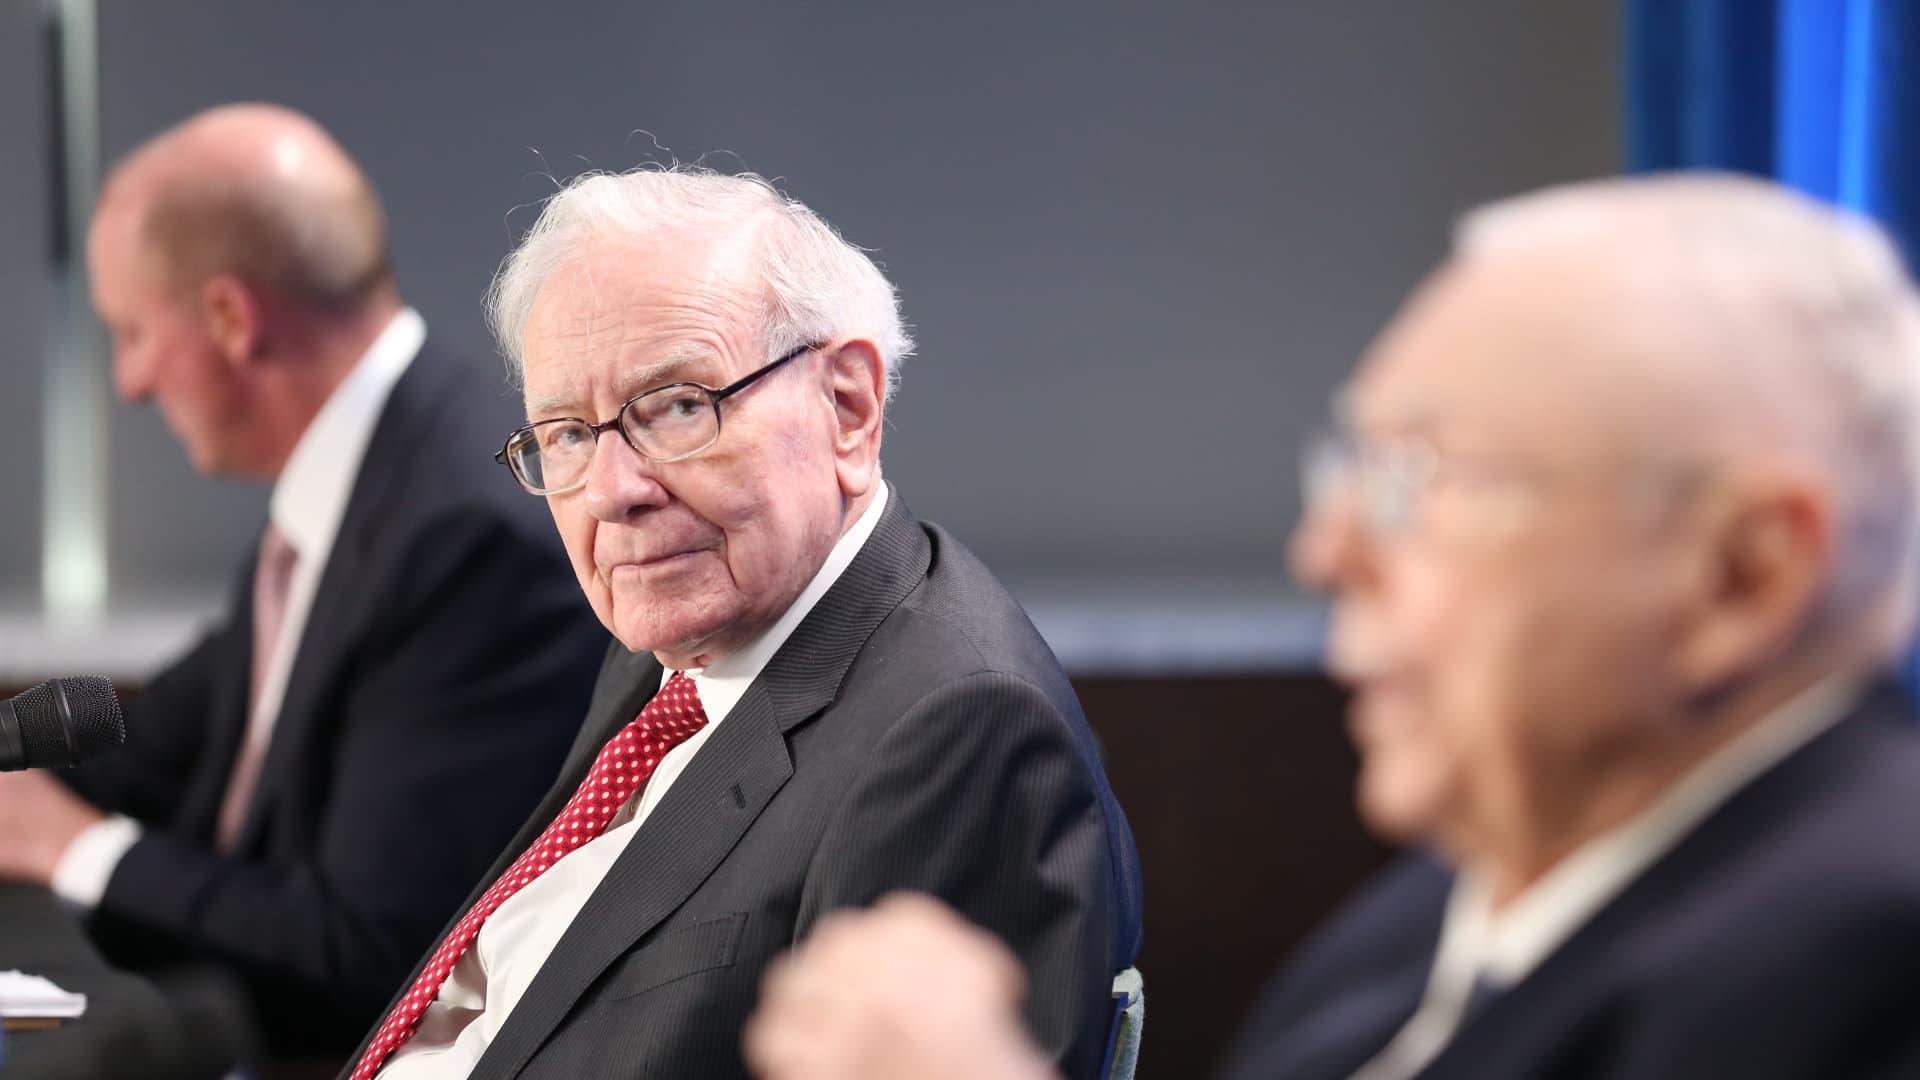 Warren Buffett at Berkshire Hathaway's annual meeting in Los Angeles California. May 1, 2021.